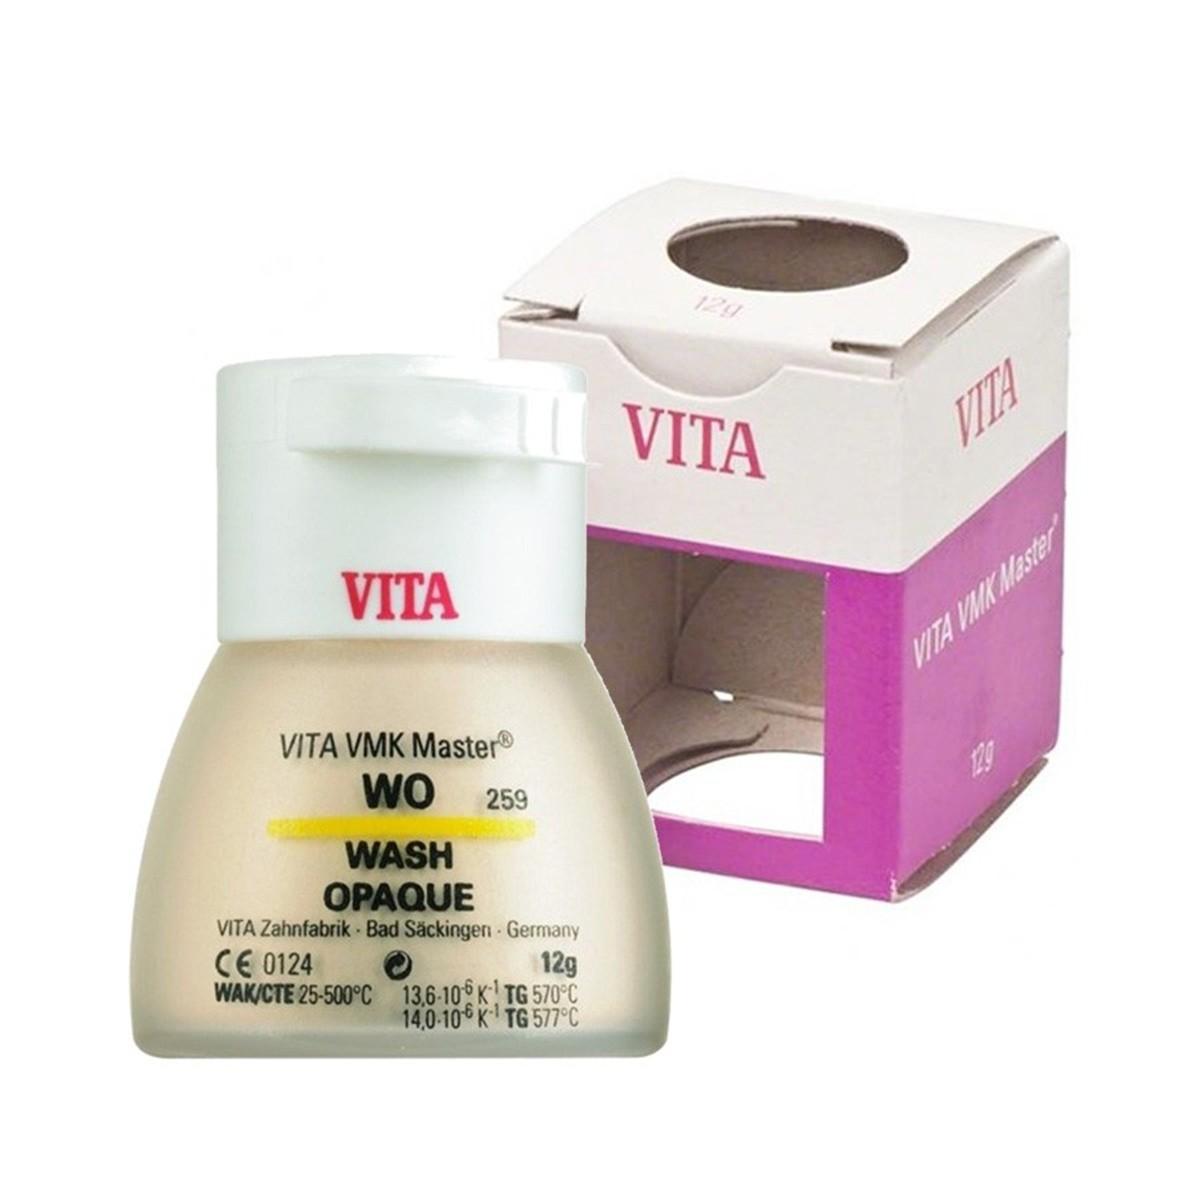 Cerâmica Vita VMK Master Wash Opaque 12g - pré opaco